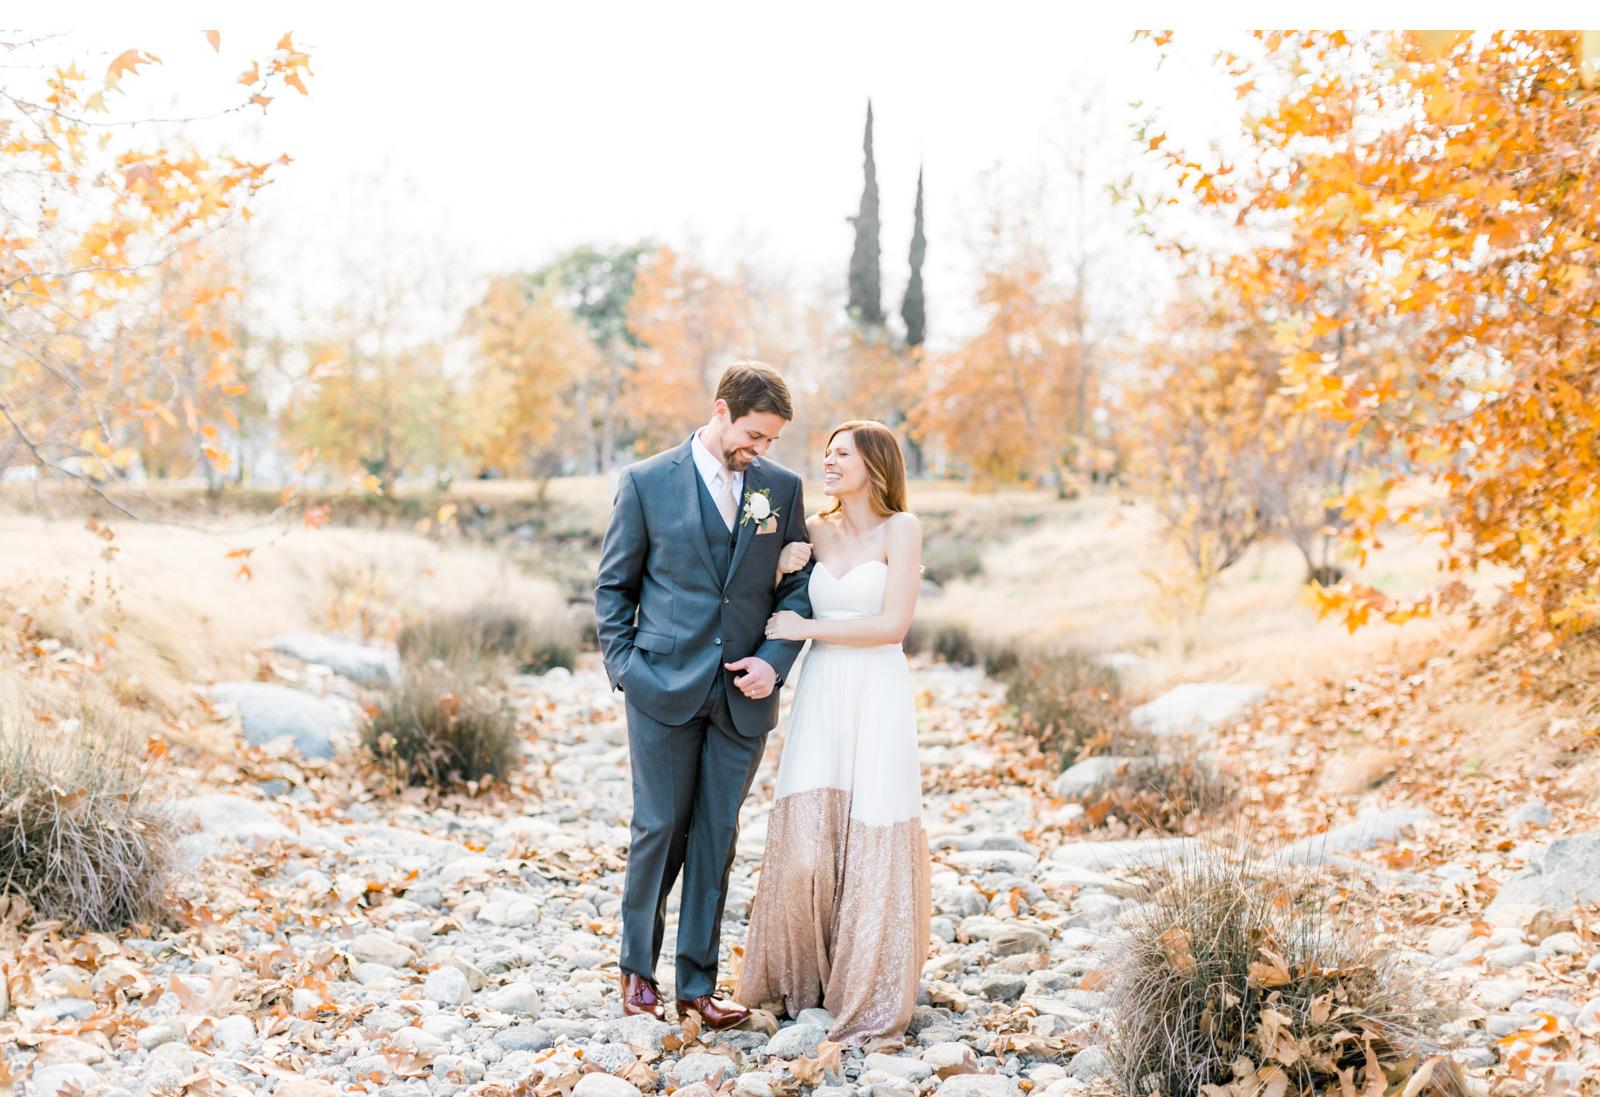 San-Diego-Wedding-Photographer-Natalie-Schutt-Photography_04.jpg